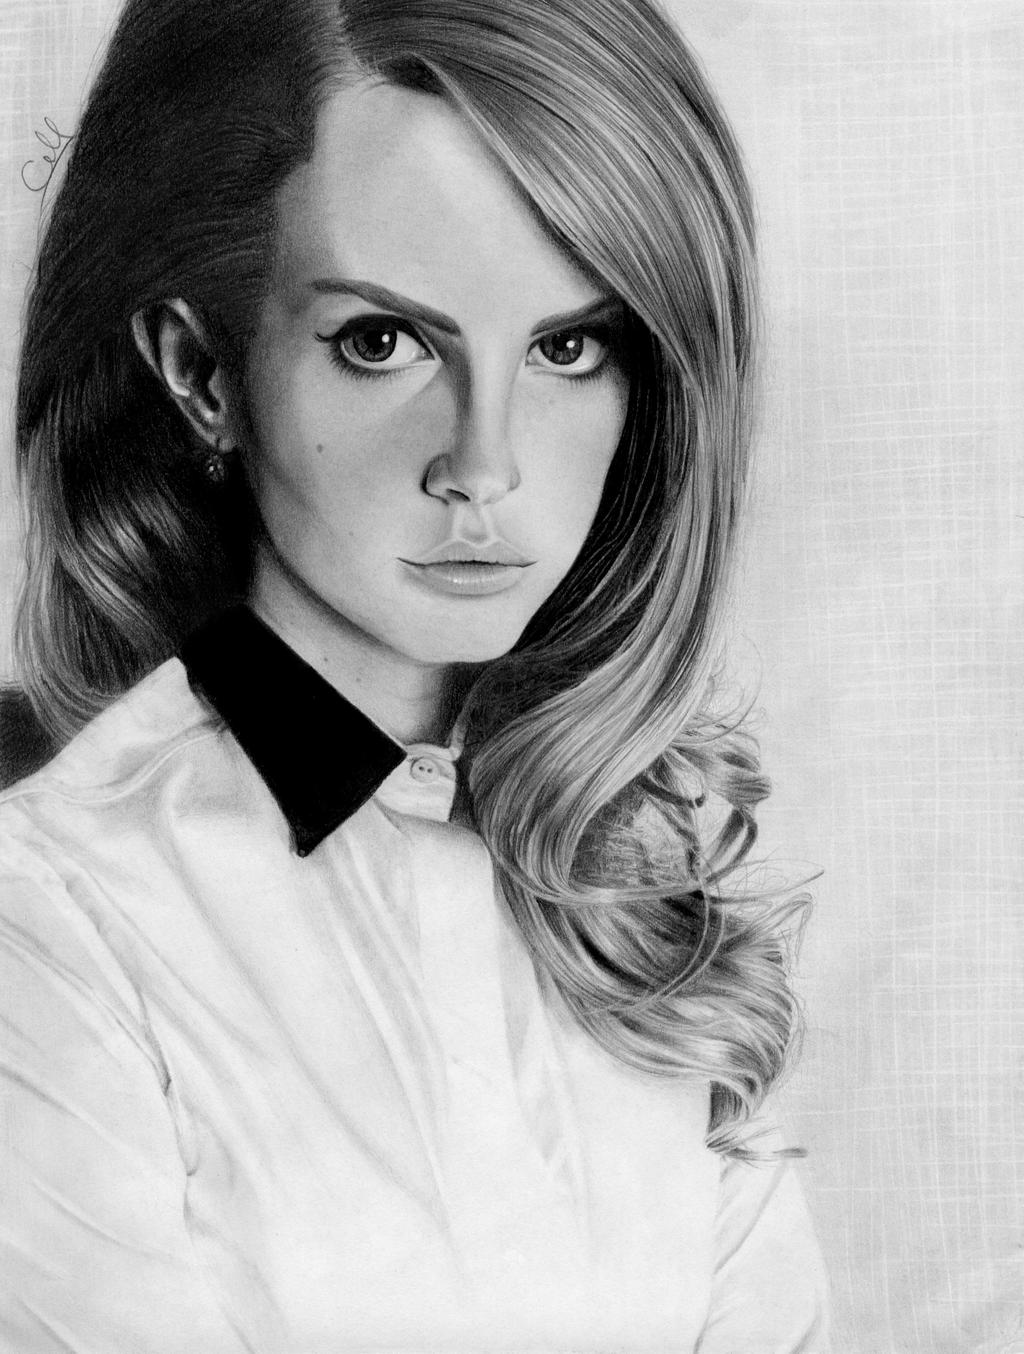 Lana Del Rey by PhotonLights